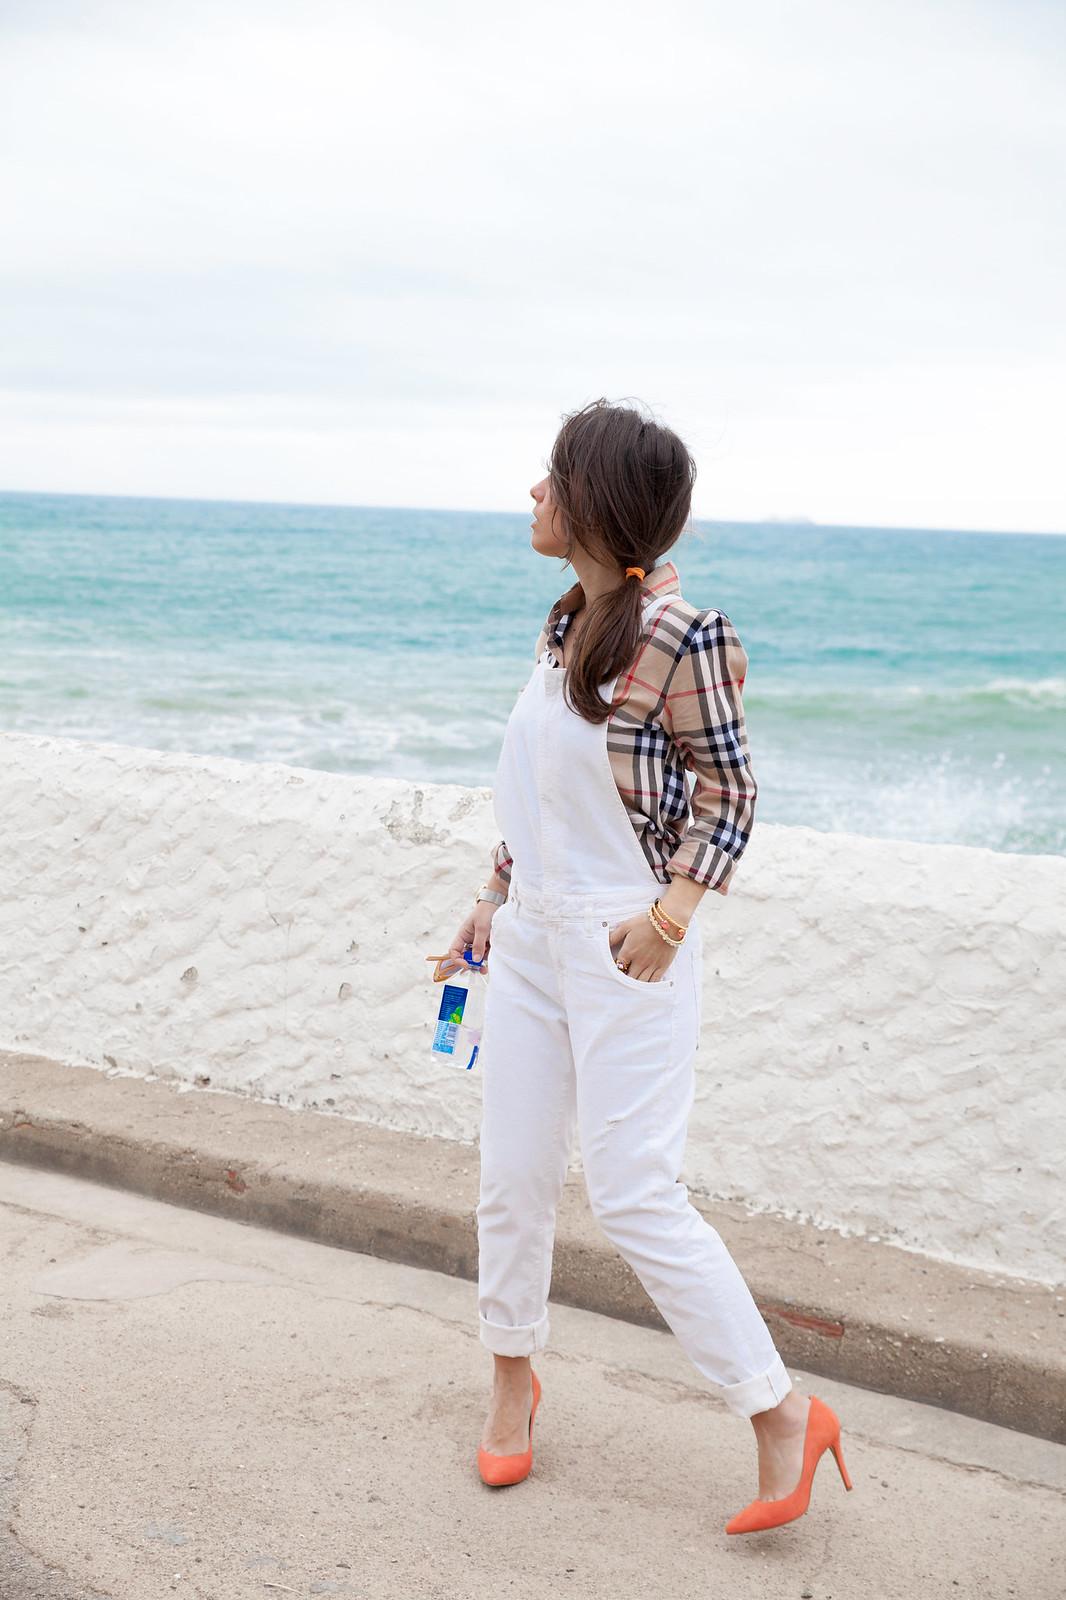 010_Burberry_Outfit_White_overall_Combinar_peto_con_tacones_mas34_theguestgirl_influencer_barcelona